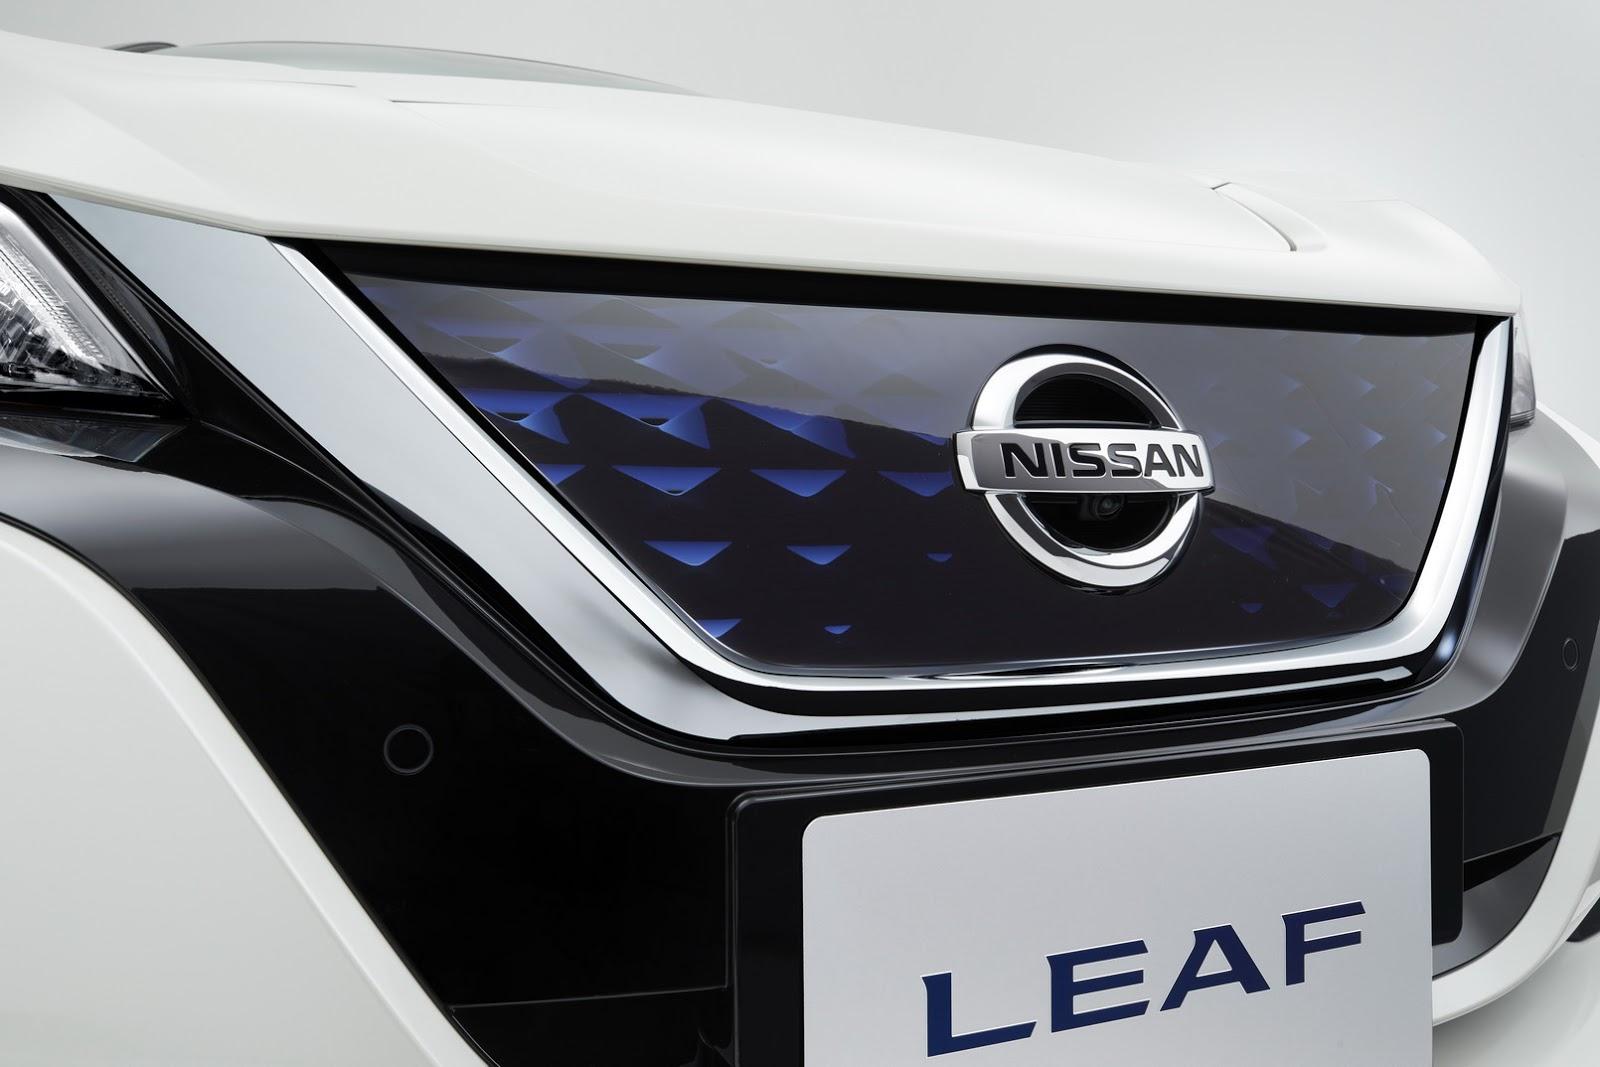 Nissan Leaf 2018 EU (16)